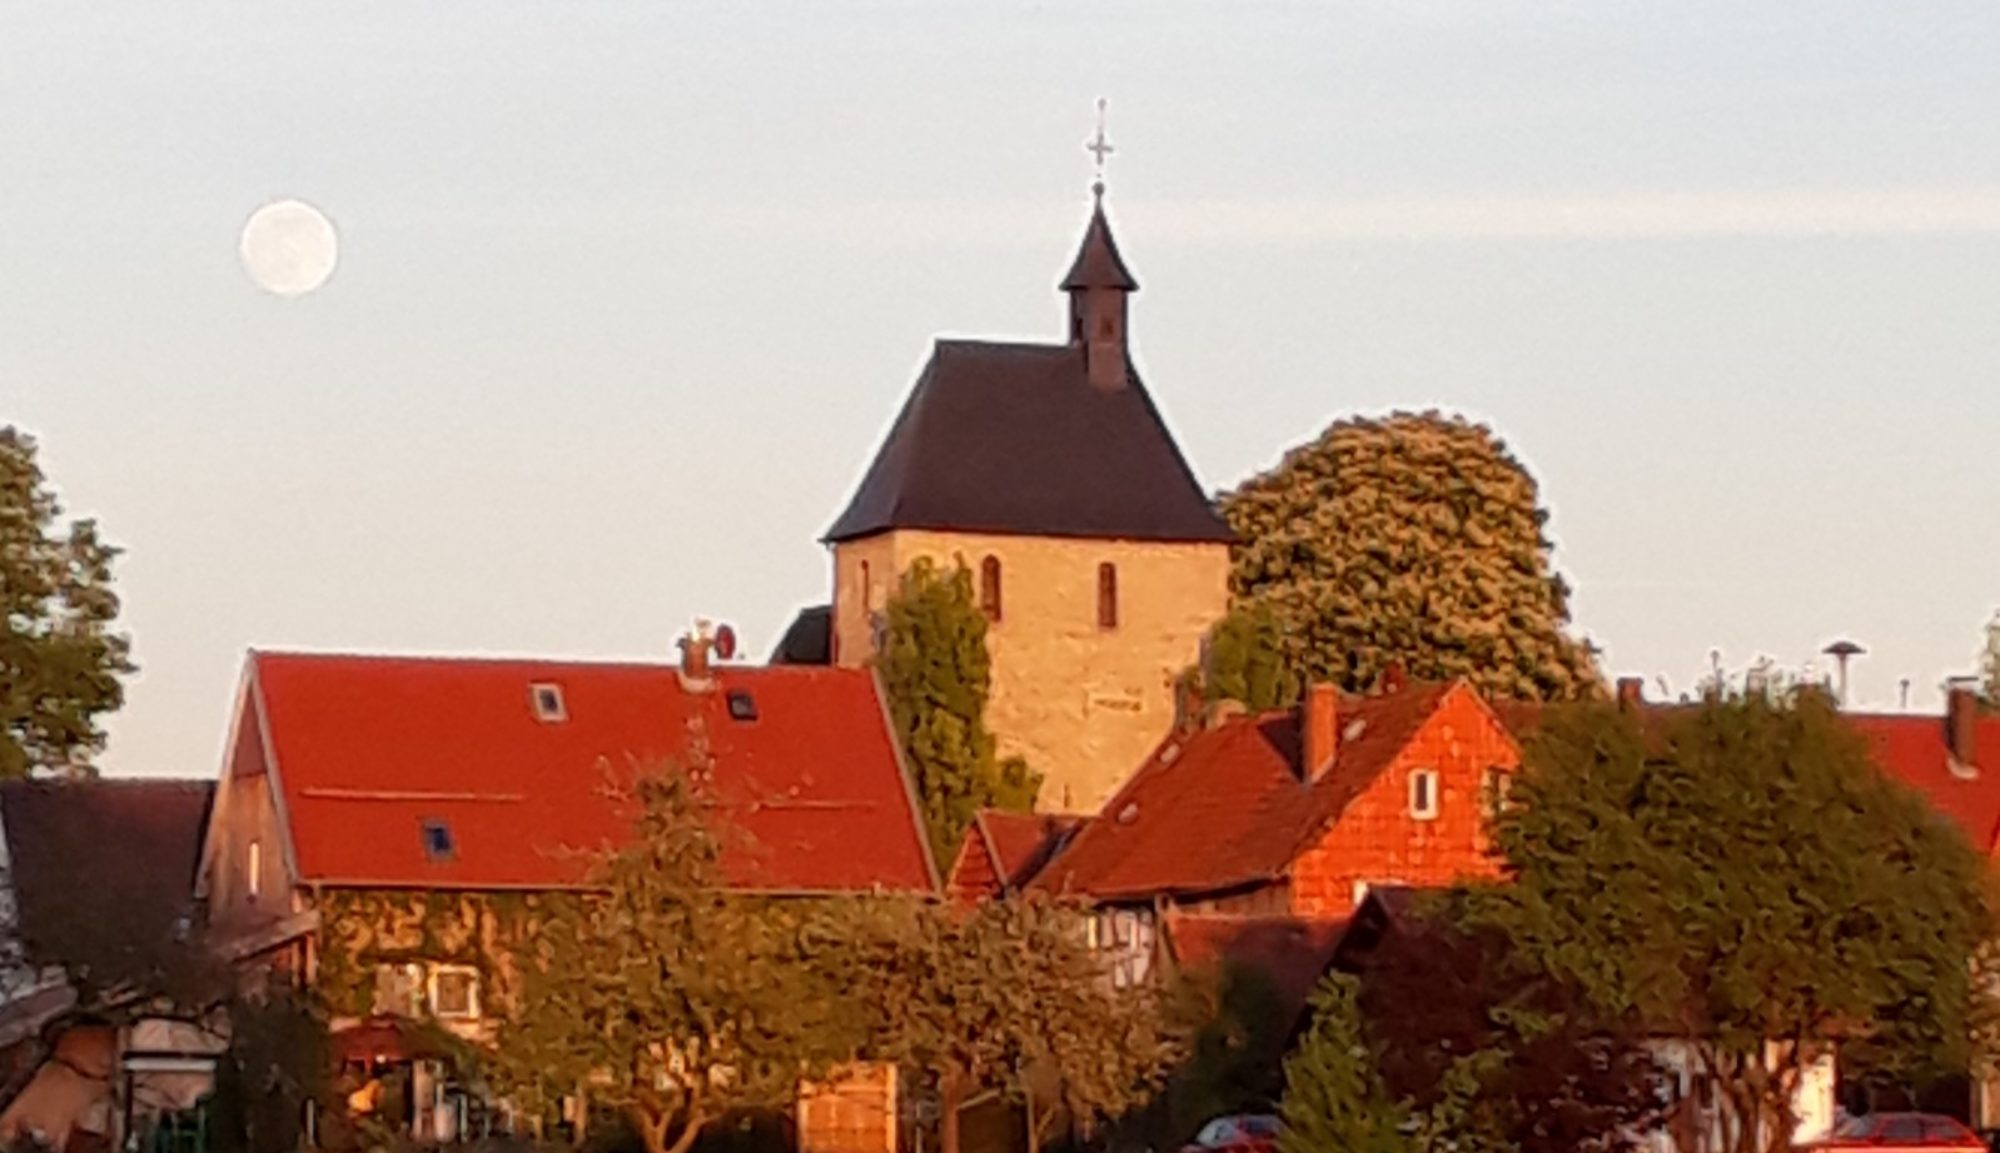 Evangelische Kirchengemeinden Wettesingen/Niederlistingen